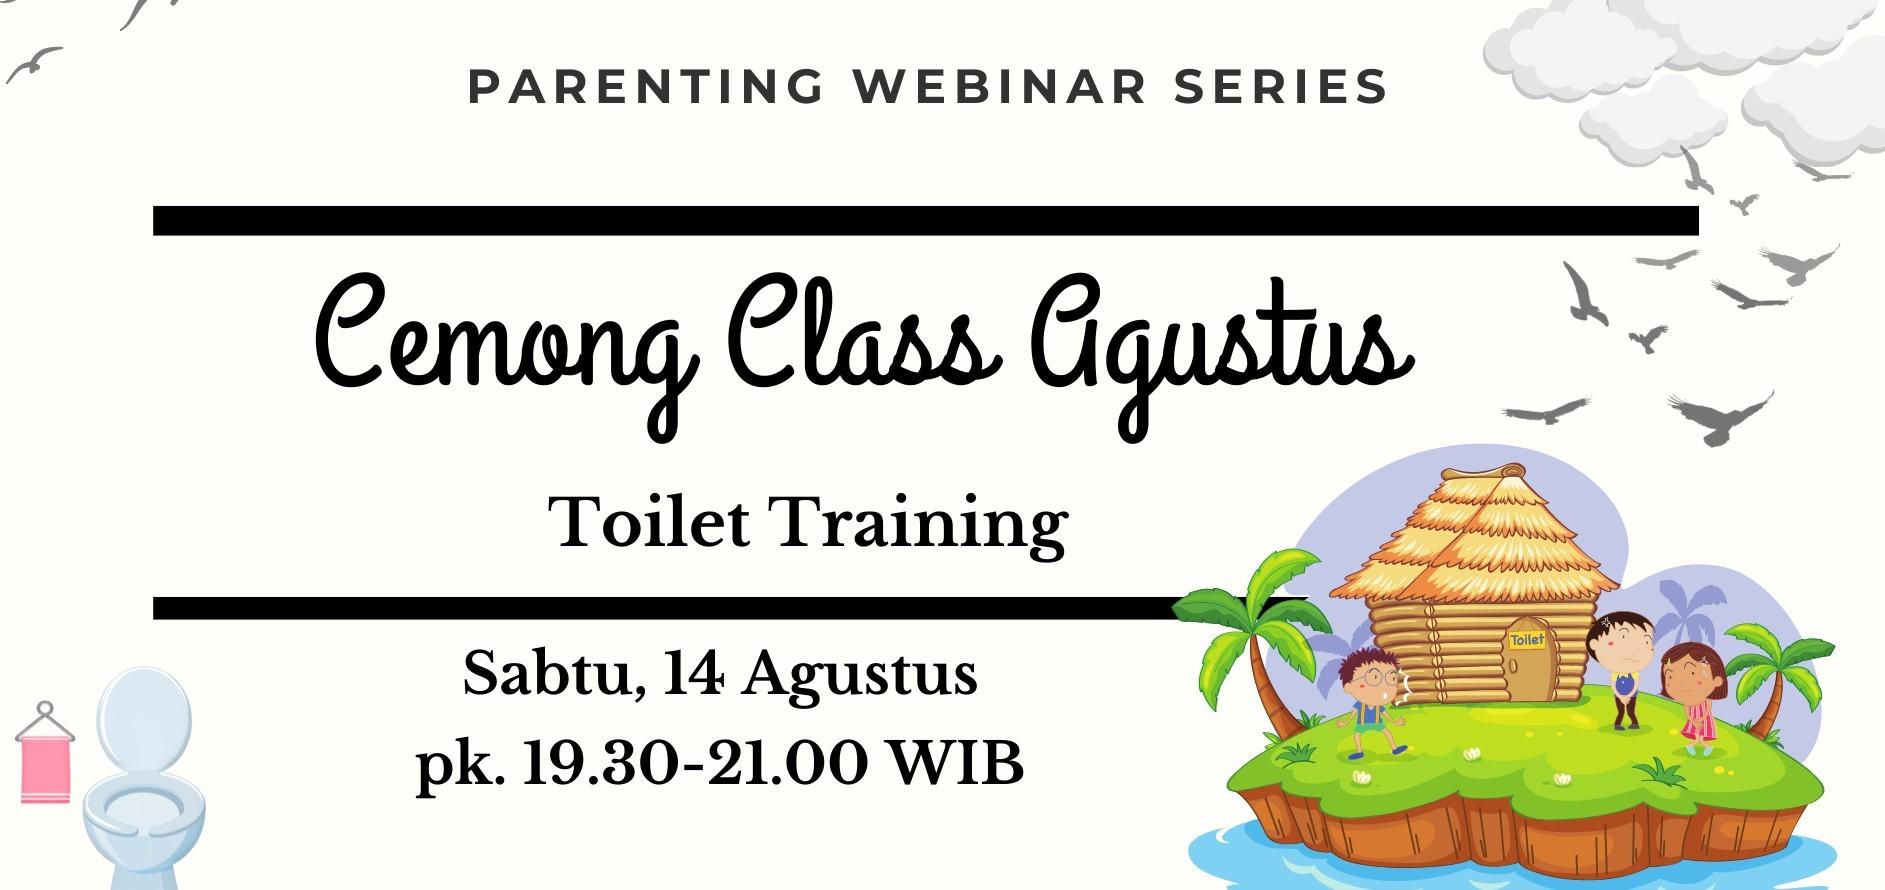 Cemong Class Agustus - Toilet Training